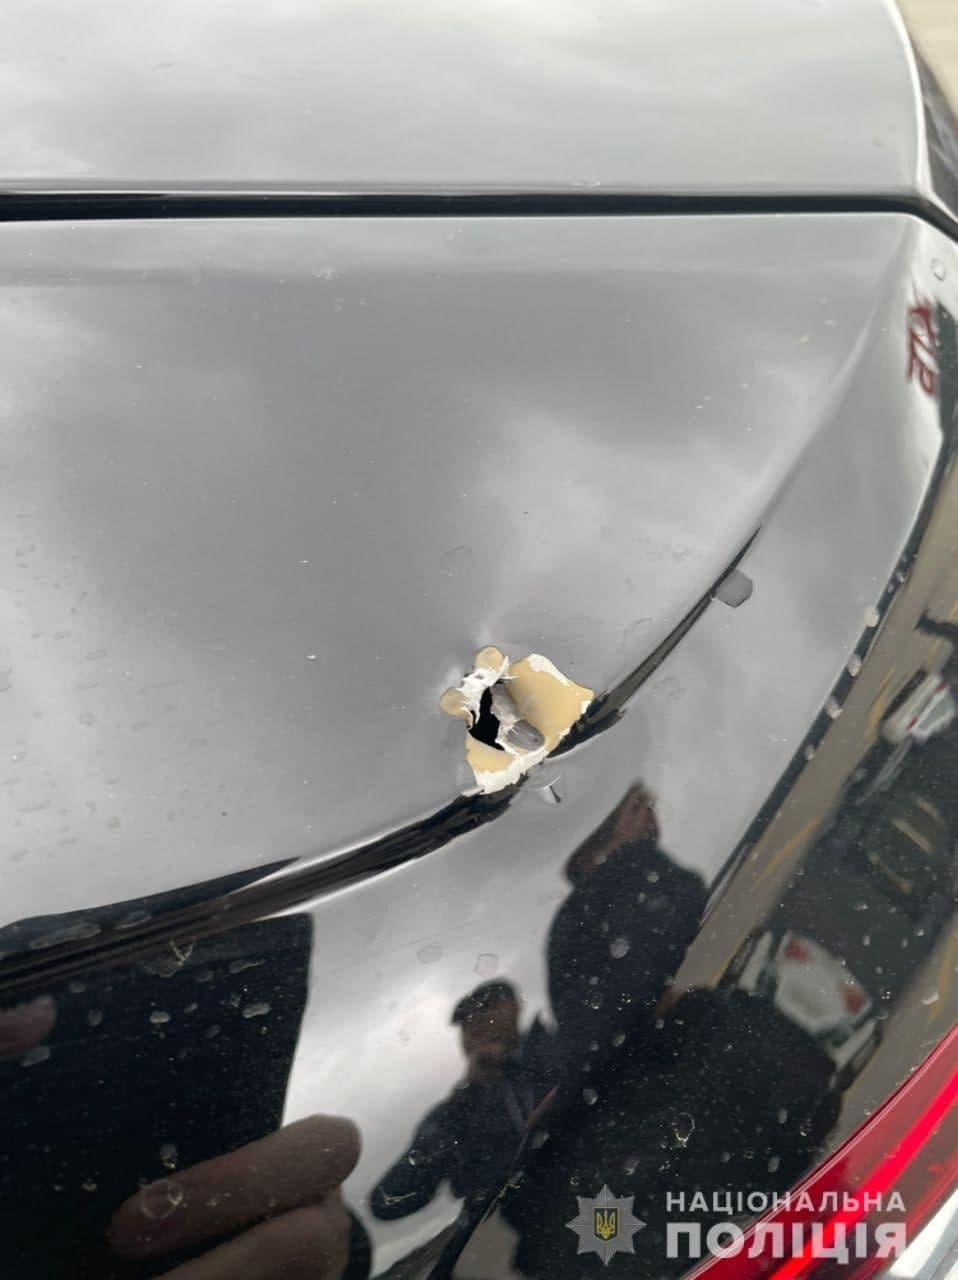 Unknown Gunmen Targeted The Car Of Ukrainian President Zelensky's Top Aide